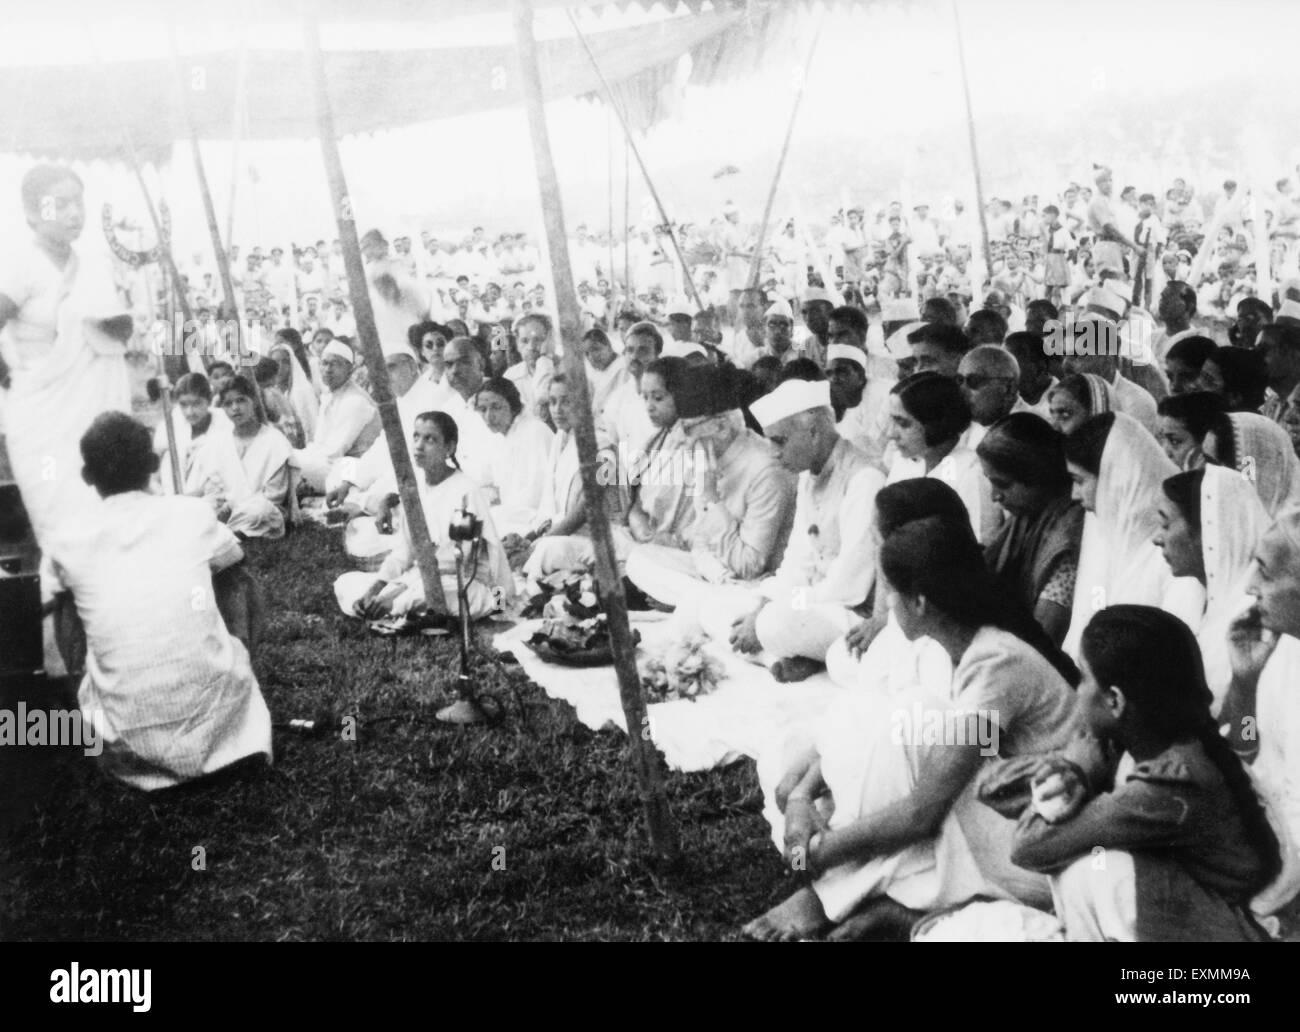 On 31st January 1948 at Rajghat New Delhi Sucheta Kripalani Abdul Kalam Maulana Azad ; Jawaharlal Nehru Mridulabehn - Stock Image